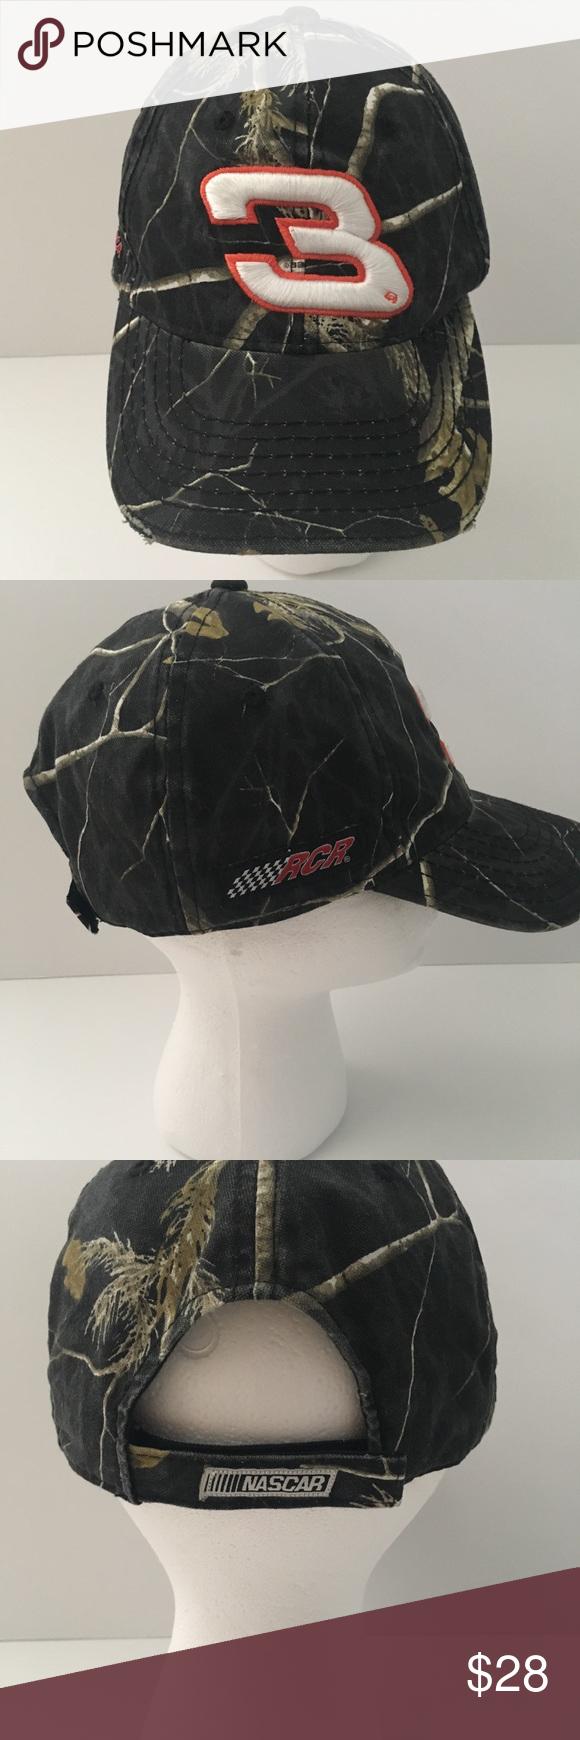 5fb9b49f Official NASCAR Dale Earnhardt Camo Baseball Cap Excellent Condition! #3  Dale Earnhardt NASCAR Baseball Cap! One Size Nascar Accessories Hats